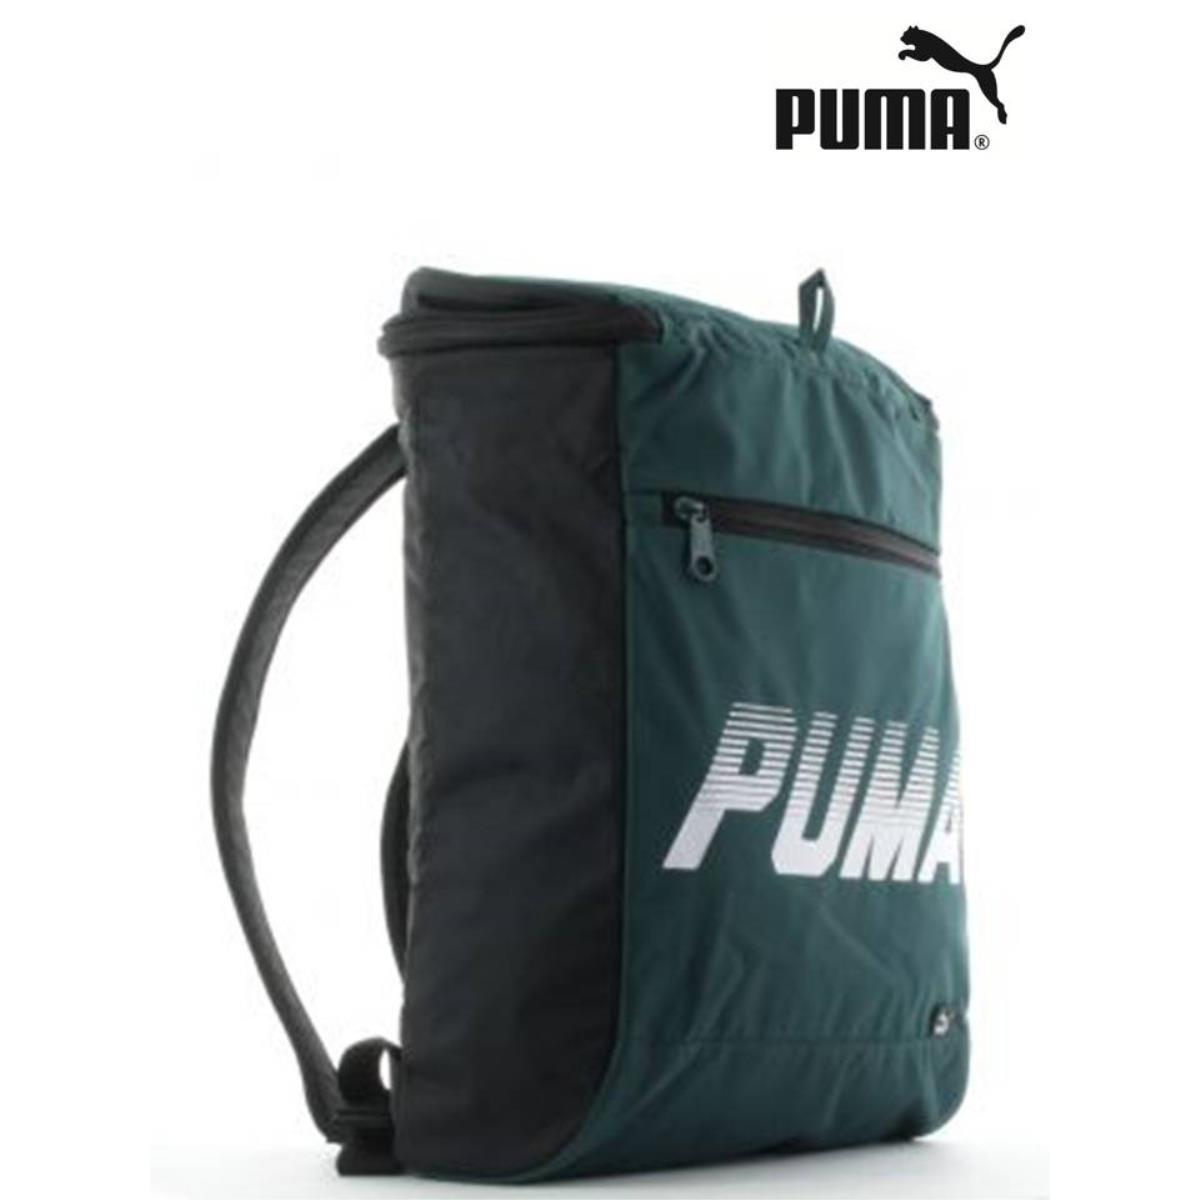 8b0db9712f Puma Sole Backpack | PMC Sports - Wholesale Sportswear & Fashion | Nike,  Adidas, Vans, Lacoste, Puma.